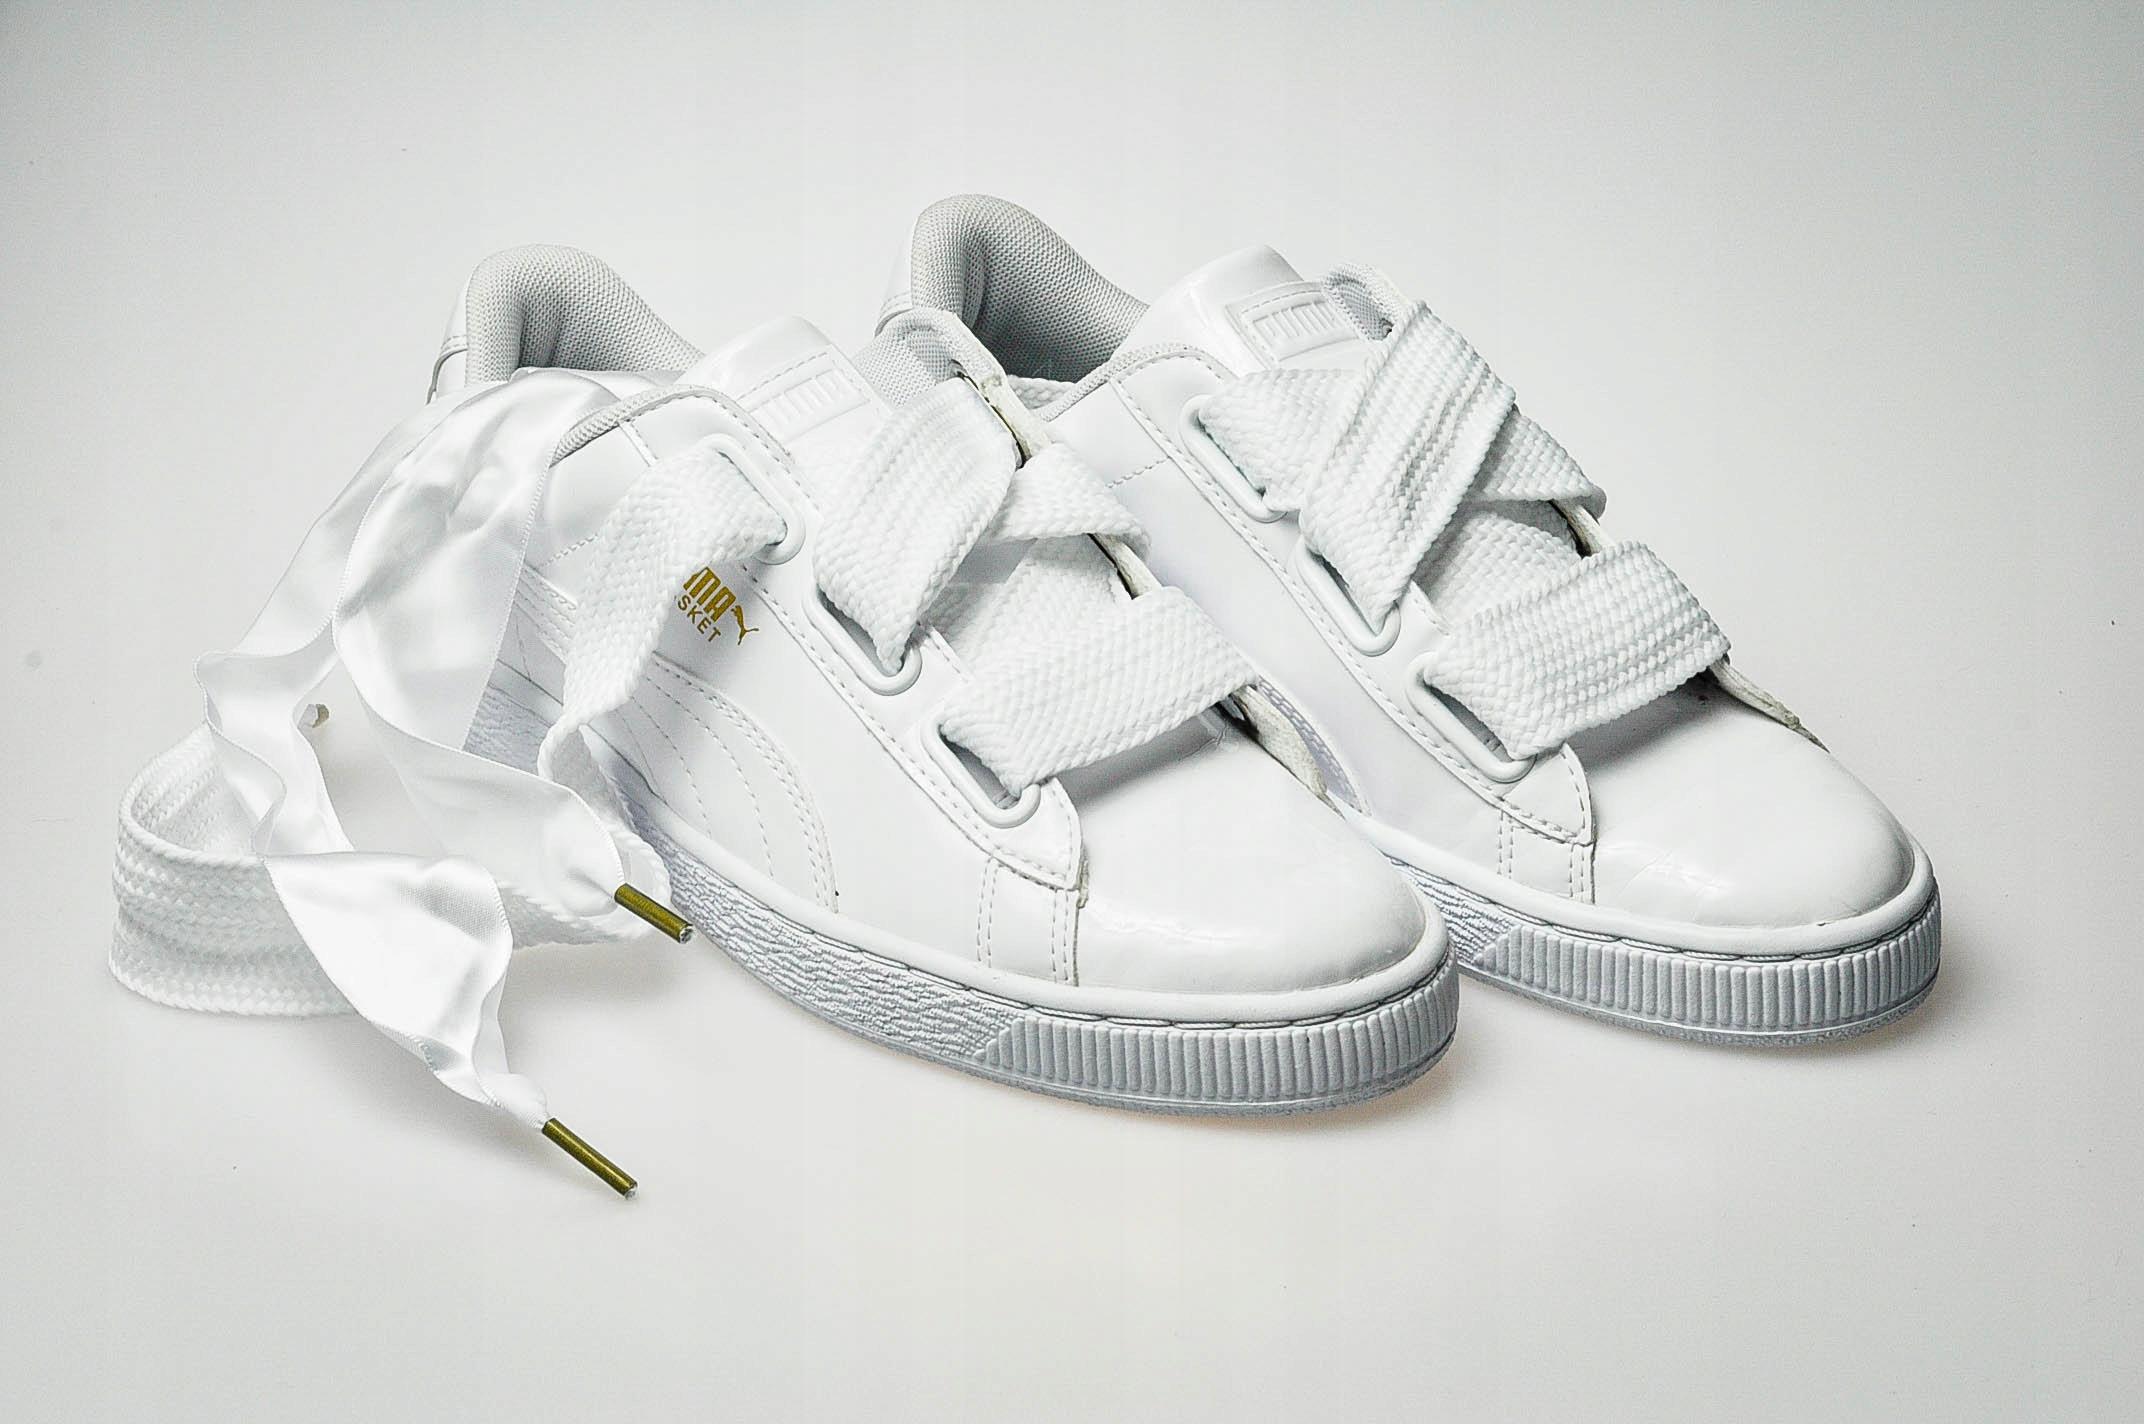 02aa1573 Puma BASKET HEART PATENT Sneakersy r.39 !Wyprzedaż - 7505440002 ...